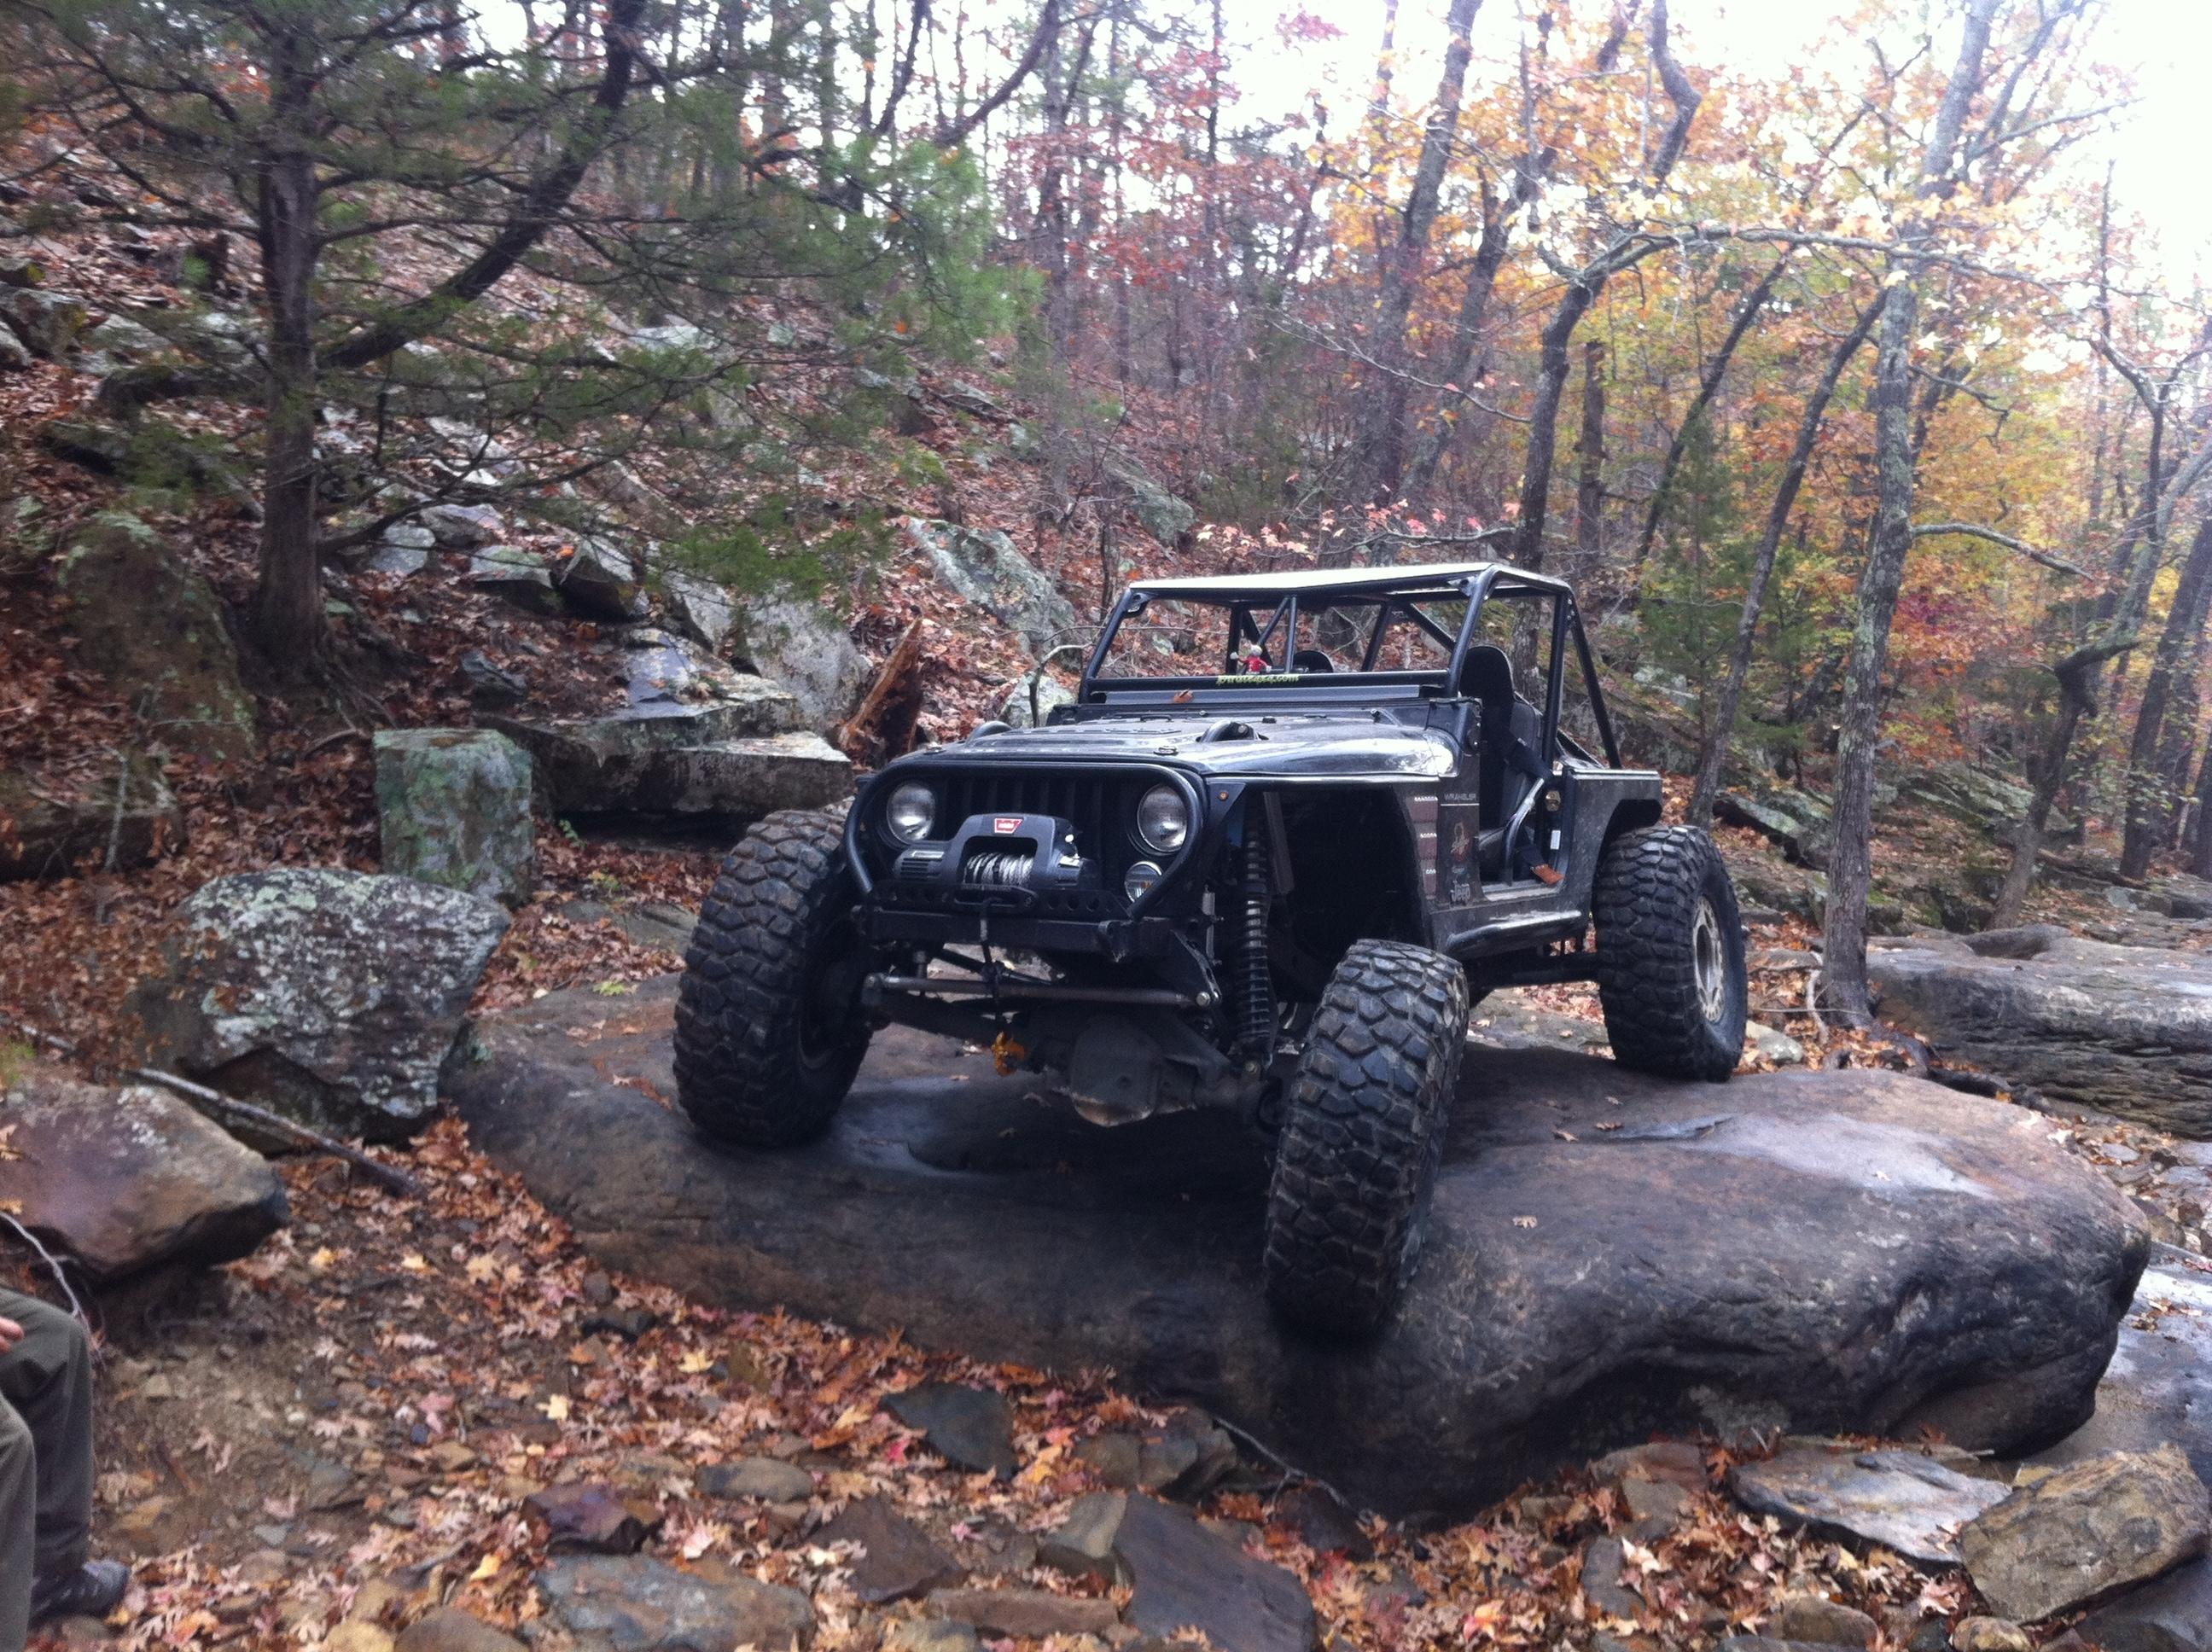 Jeep Rock Crawler Rock Crawler 4x4 Offroad Race Racing Jeep G Wallpaper 1920x1280